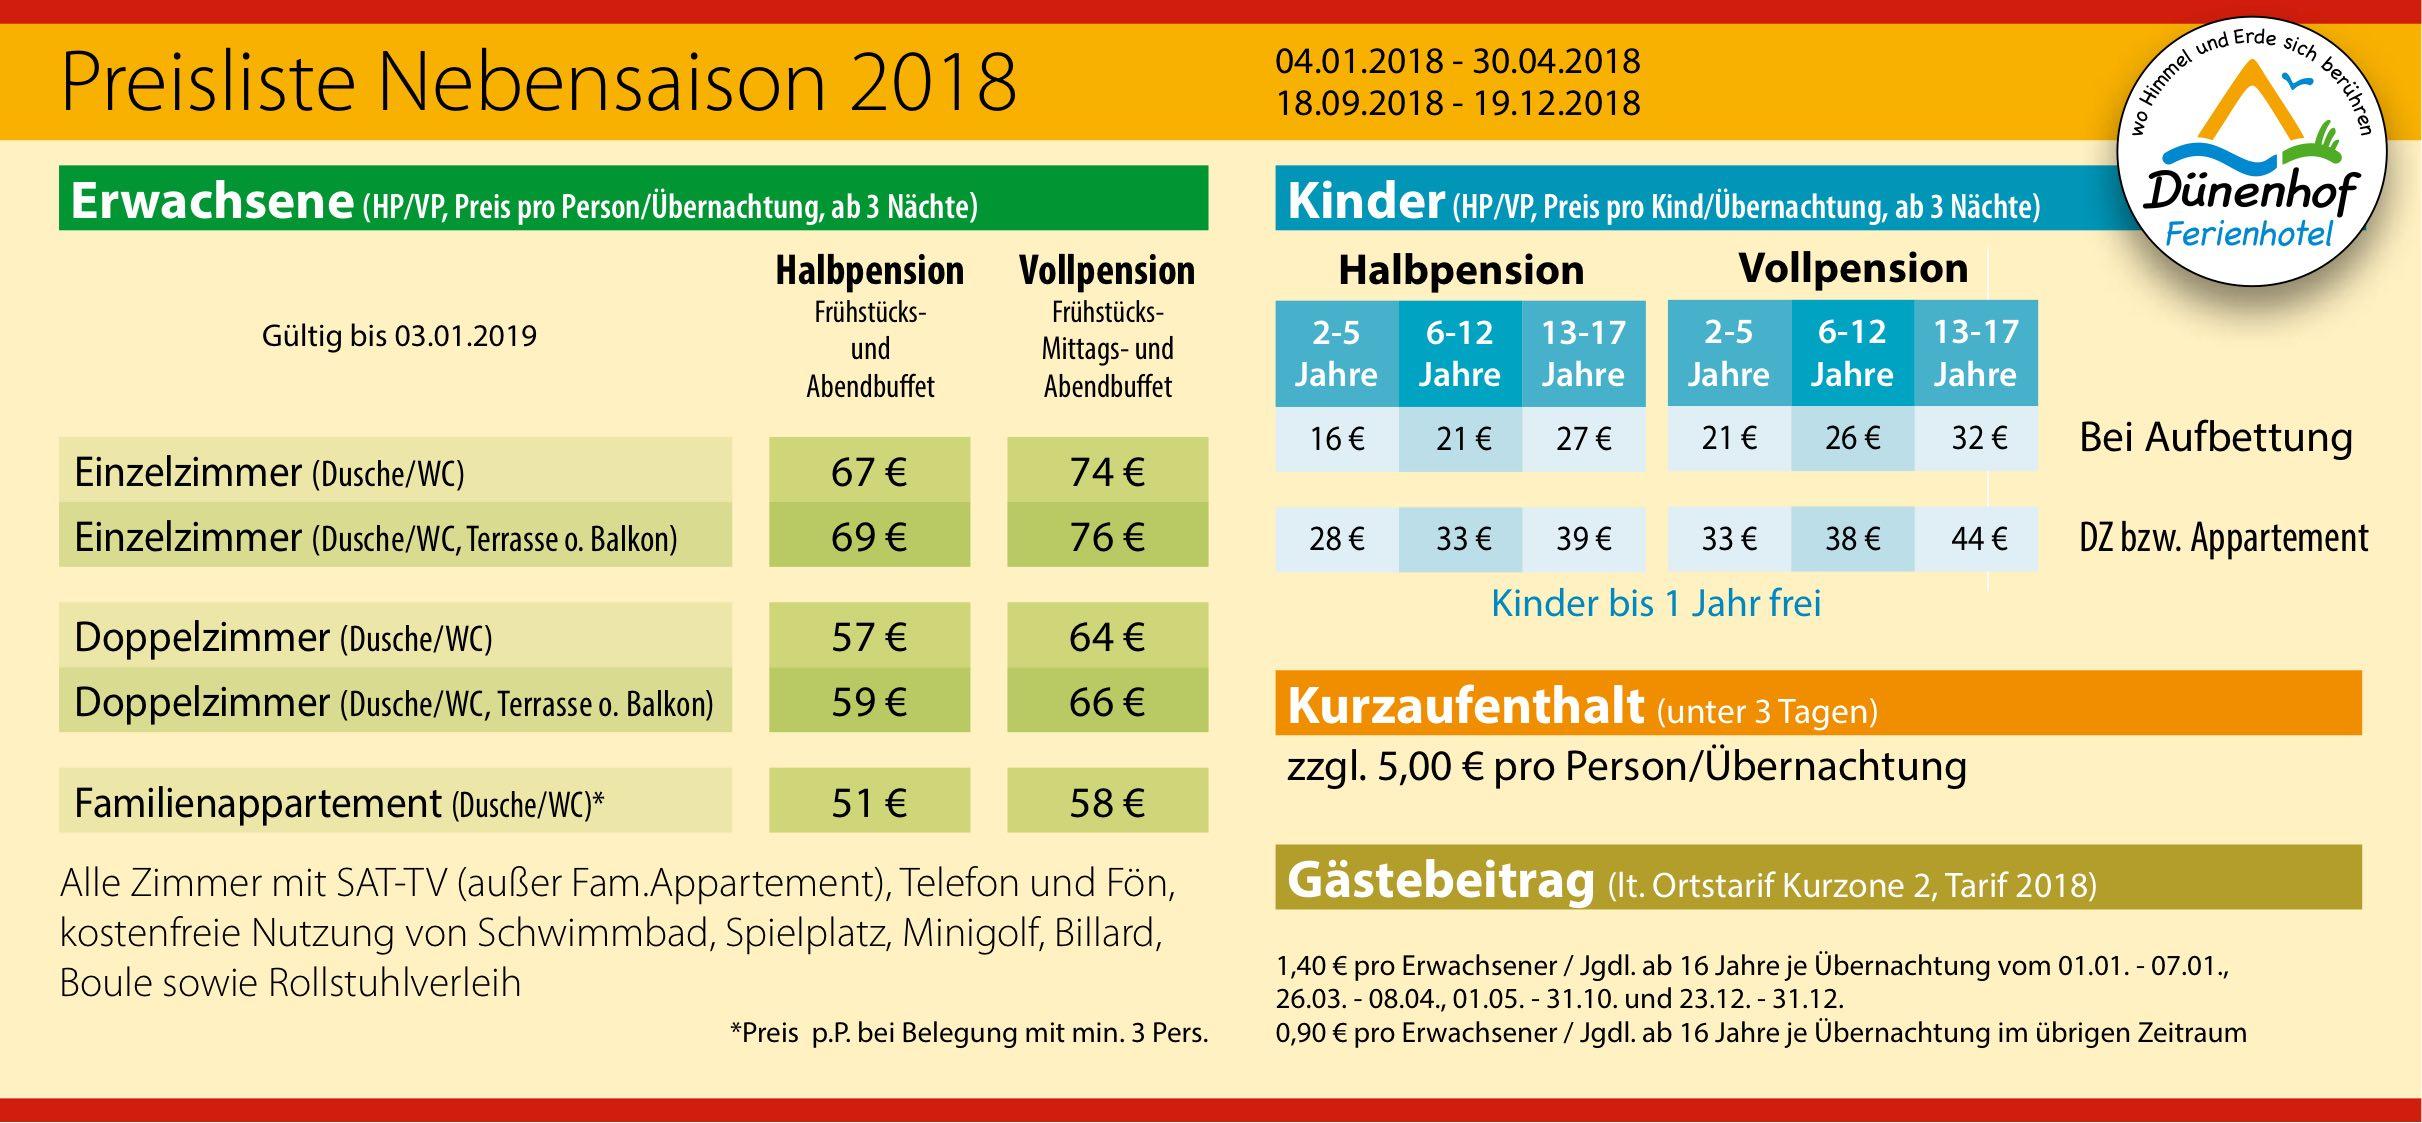 Nebensaison Preise Dünenhof Ferienhotel